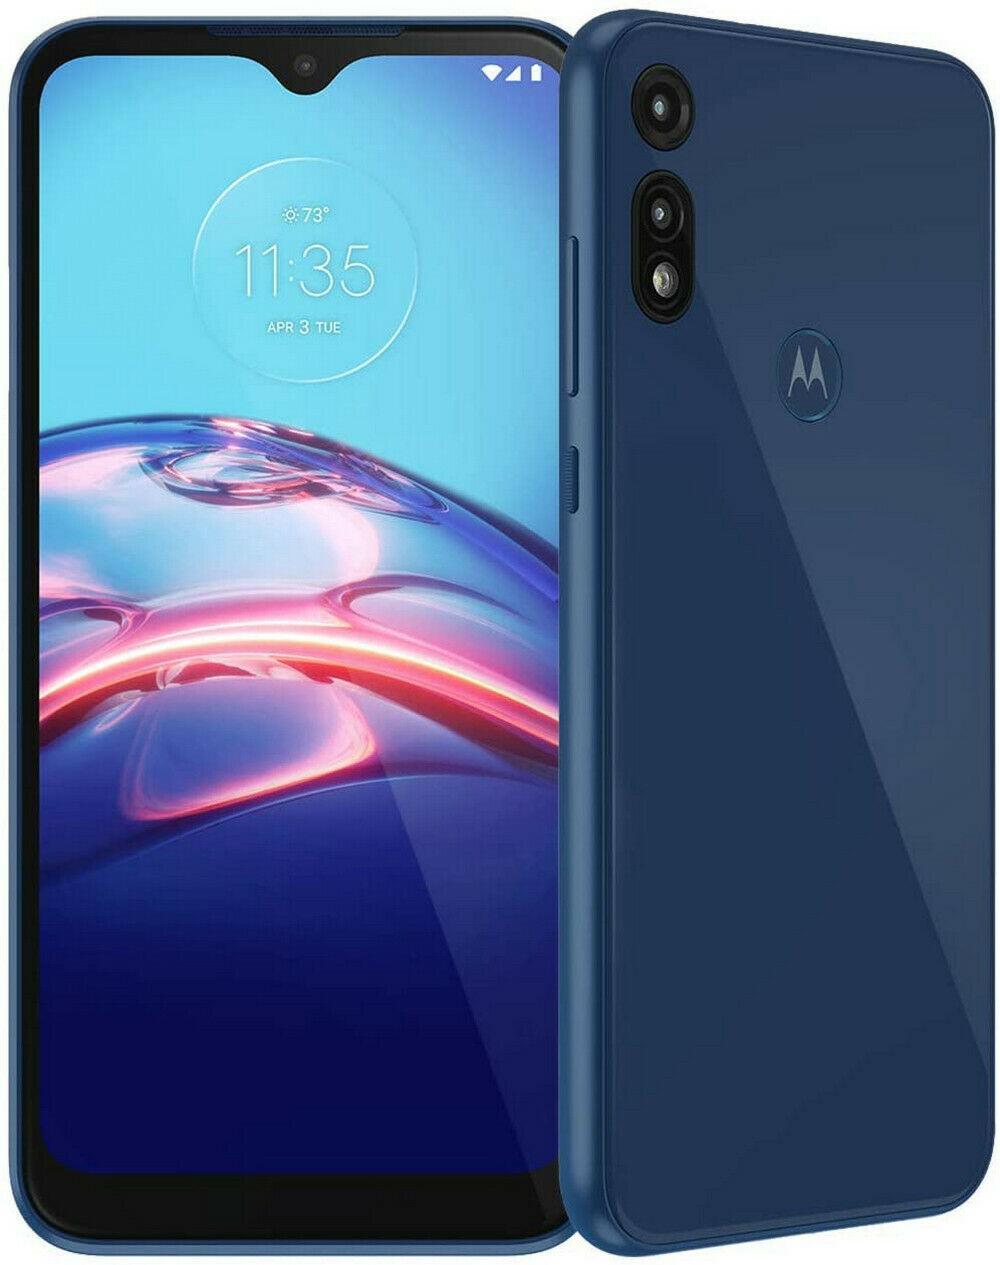 Tracfone 32GB Motorola Moto E (2020) Prepaid Smartphone (Locked) + 1-Year of Service w/ 1500 Minutes Talk, 1500 Texts & 1500 MB LTE Data - $52.49 @ eBay